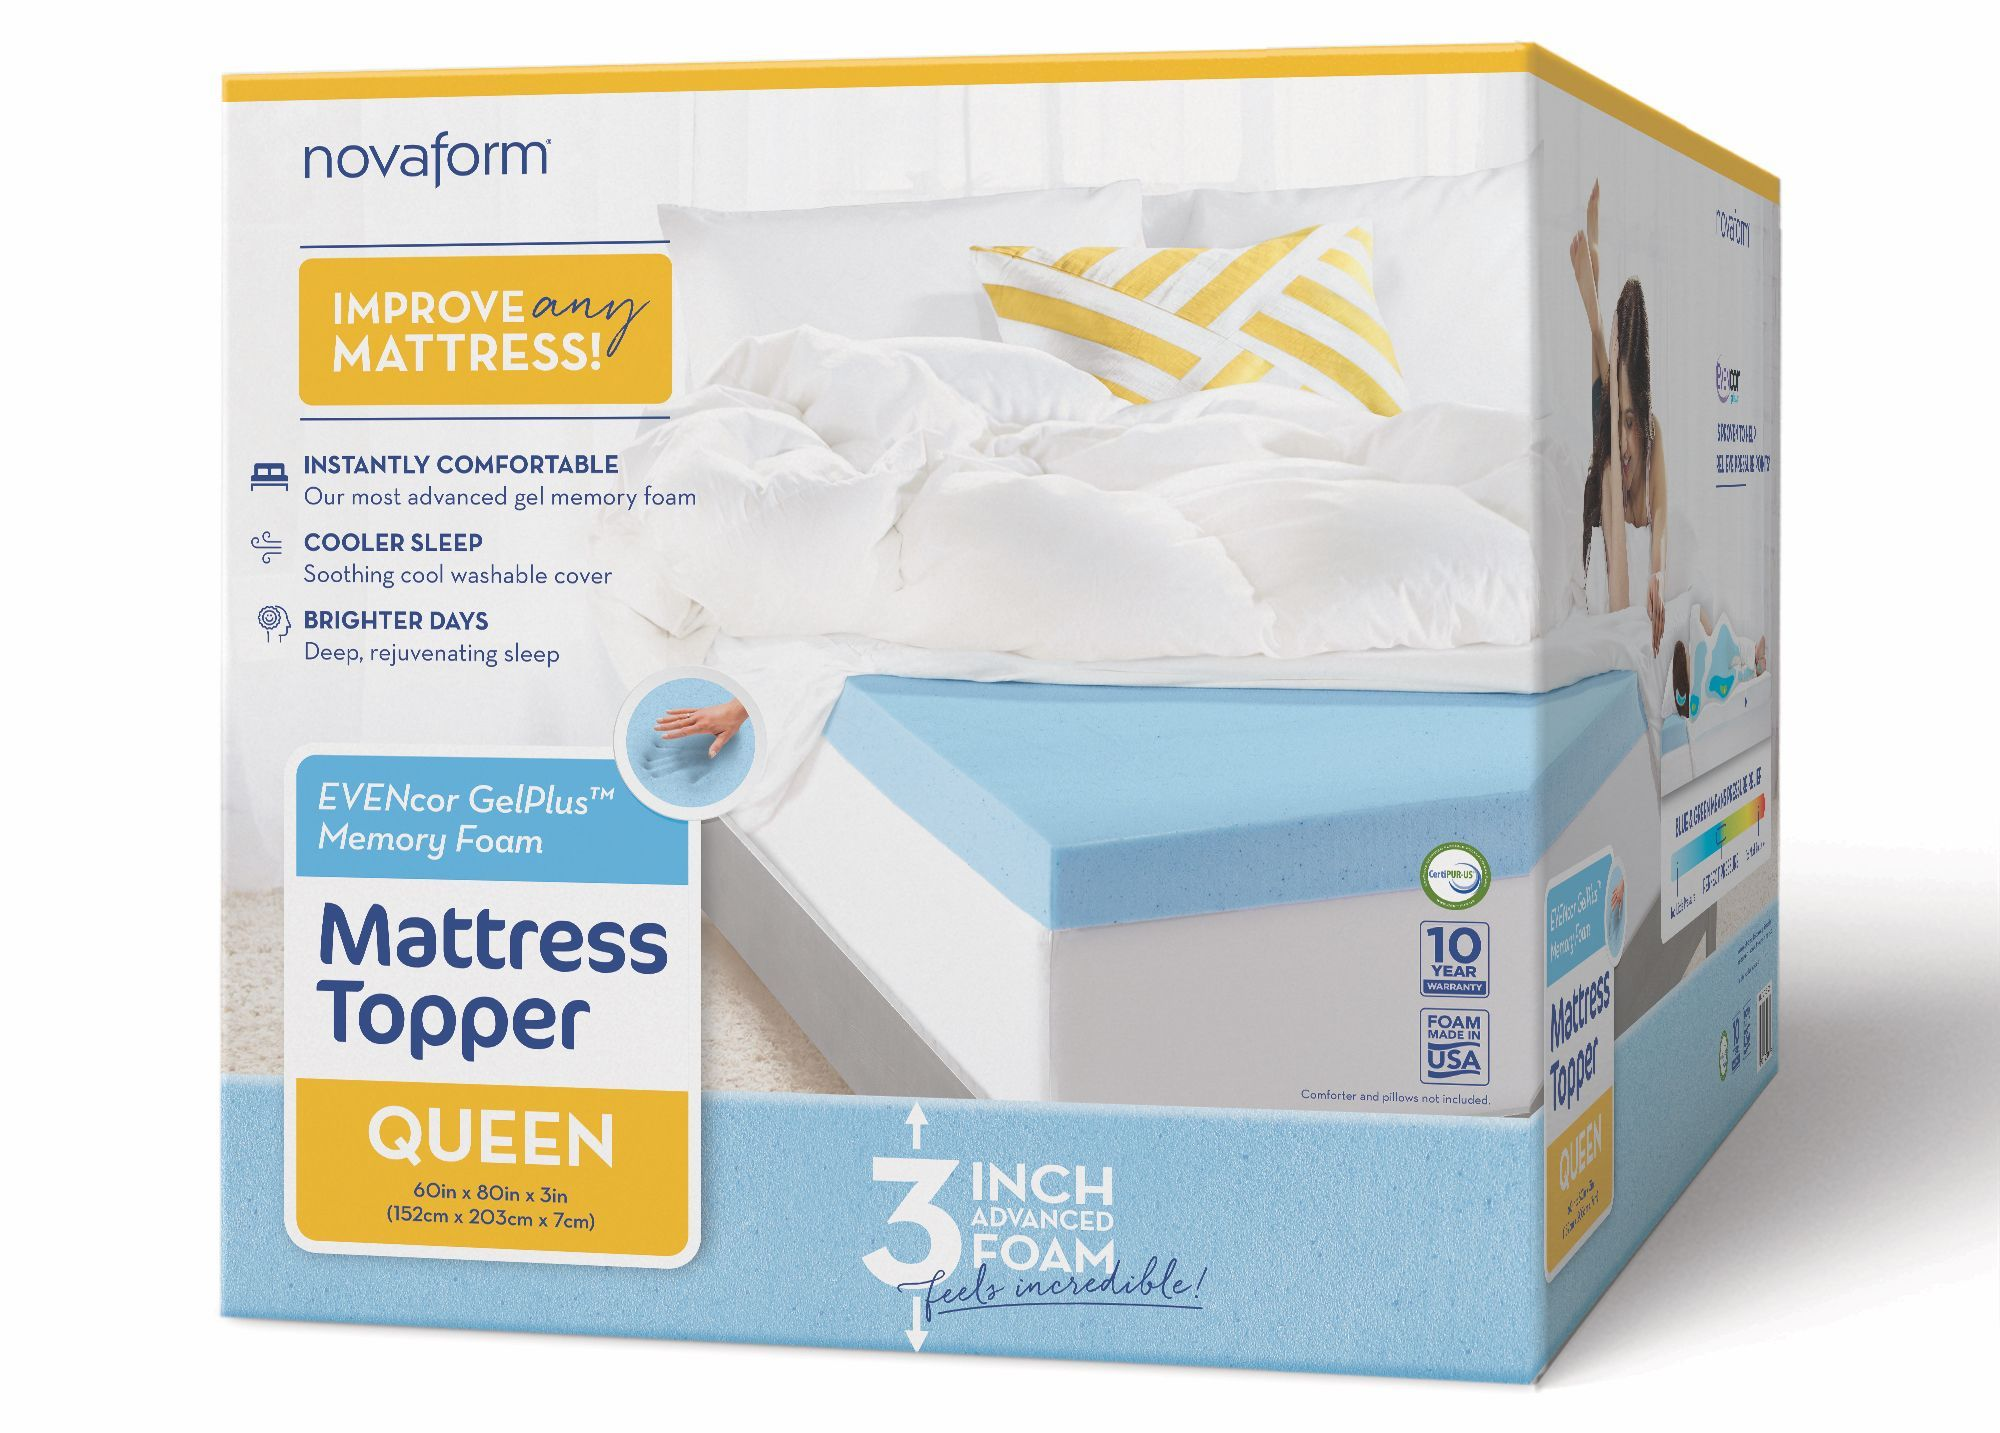 Novaform 3 Evencor Gelplus Gel Memory Foam Mattress Topper With